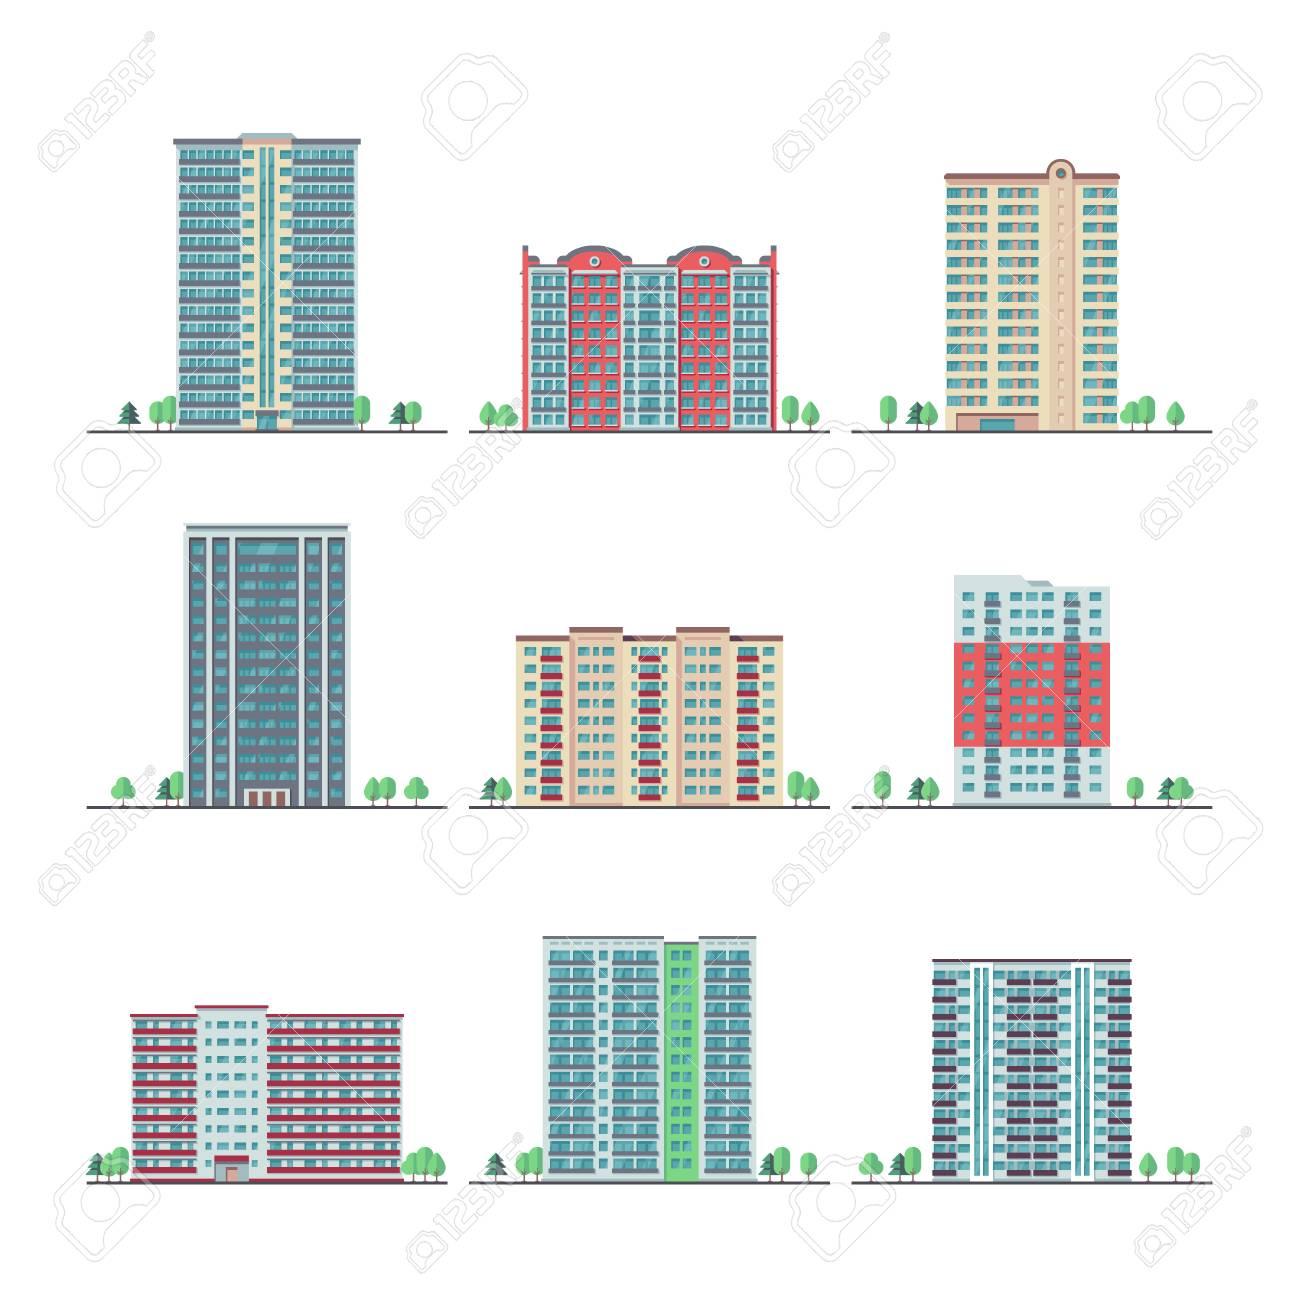 Apartment Complex Clipart Apartment House - Apartment Building Clipart -  Png Download (#88292) - PinClipart